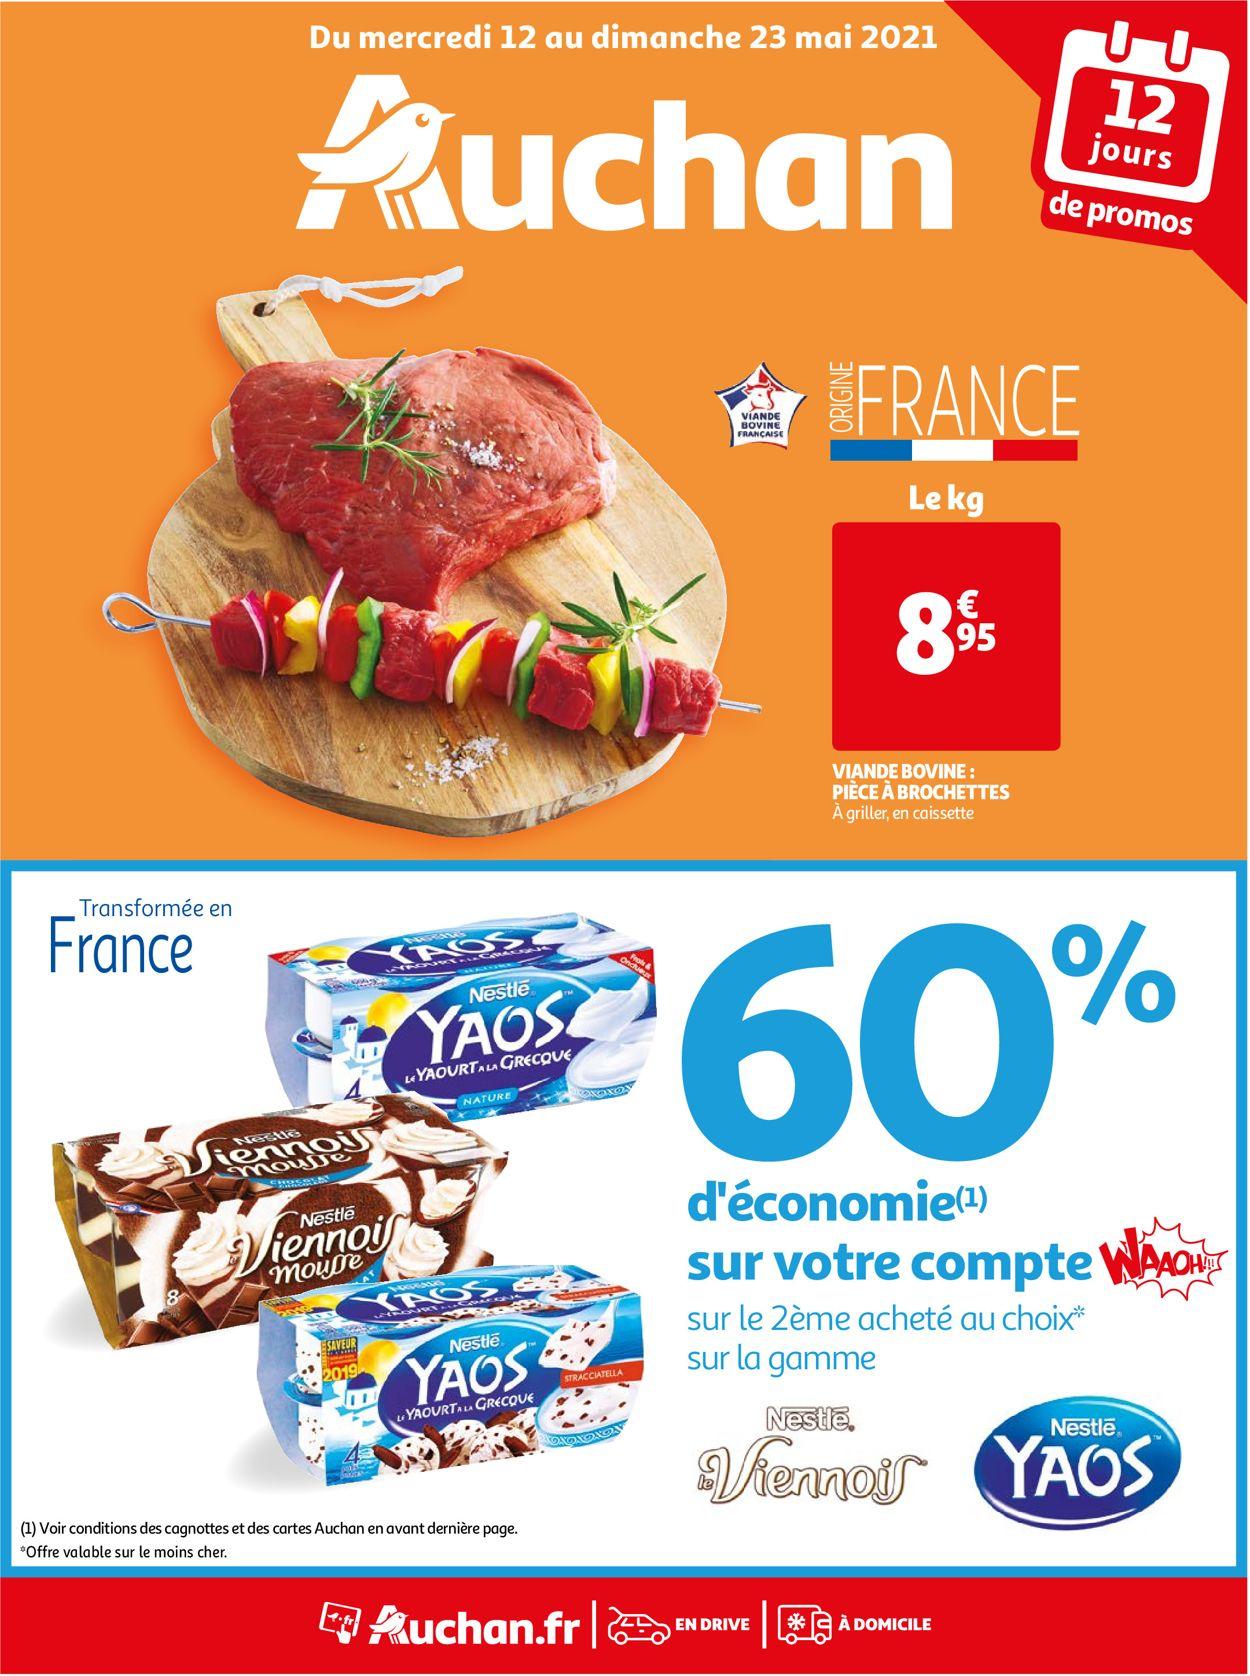 Auchan Catalogue - 12.05-23.05.2021